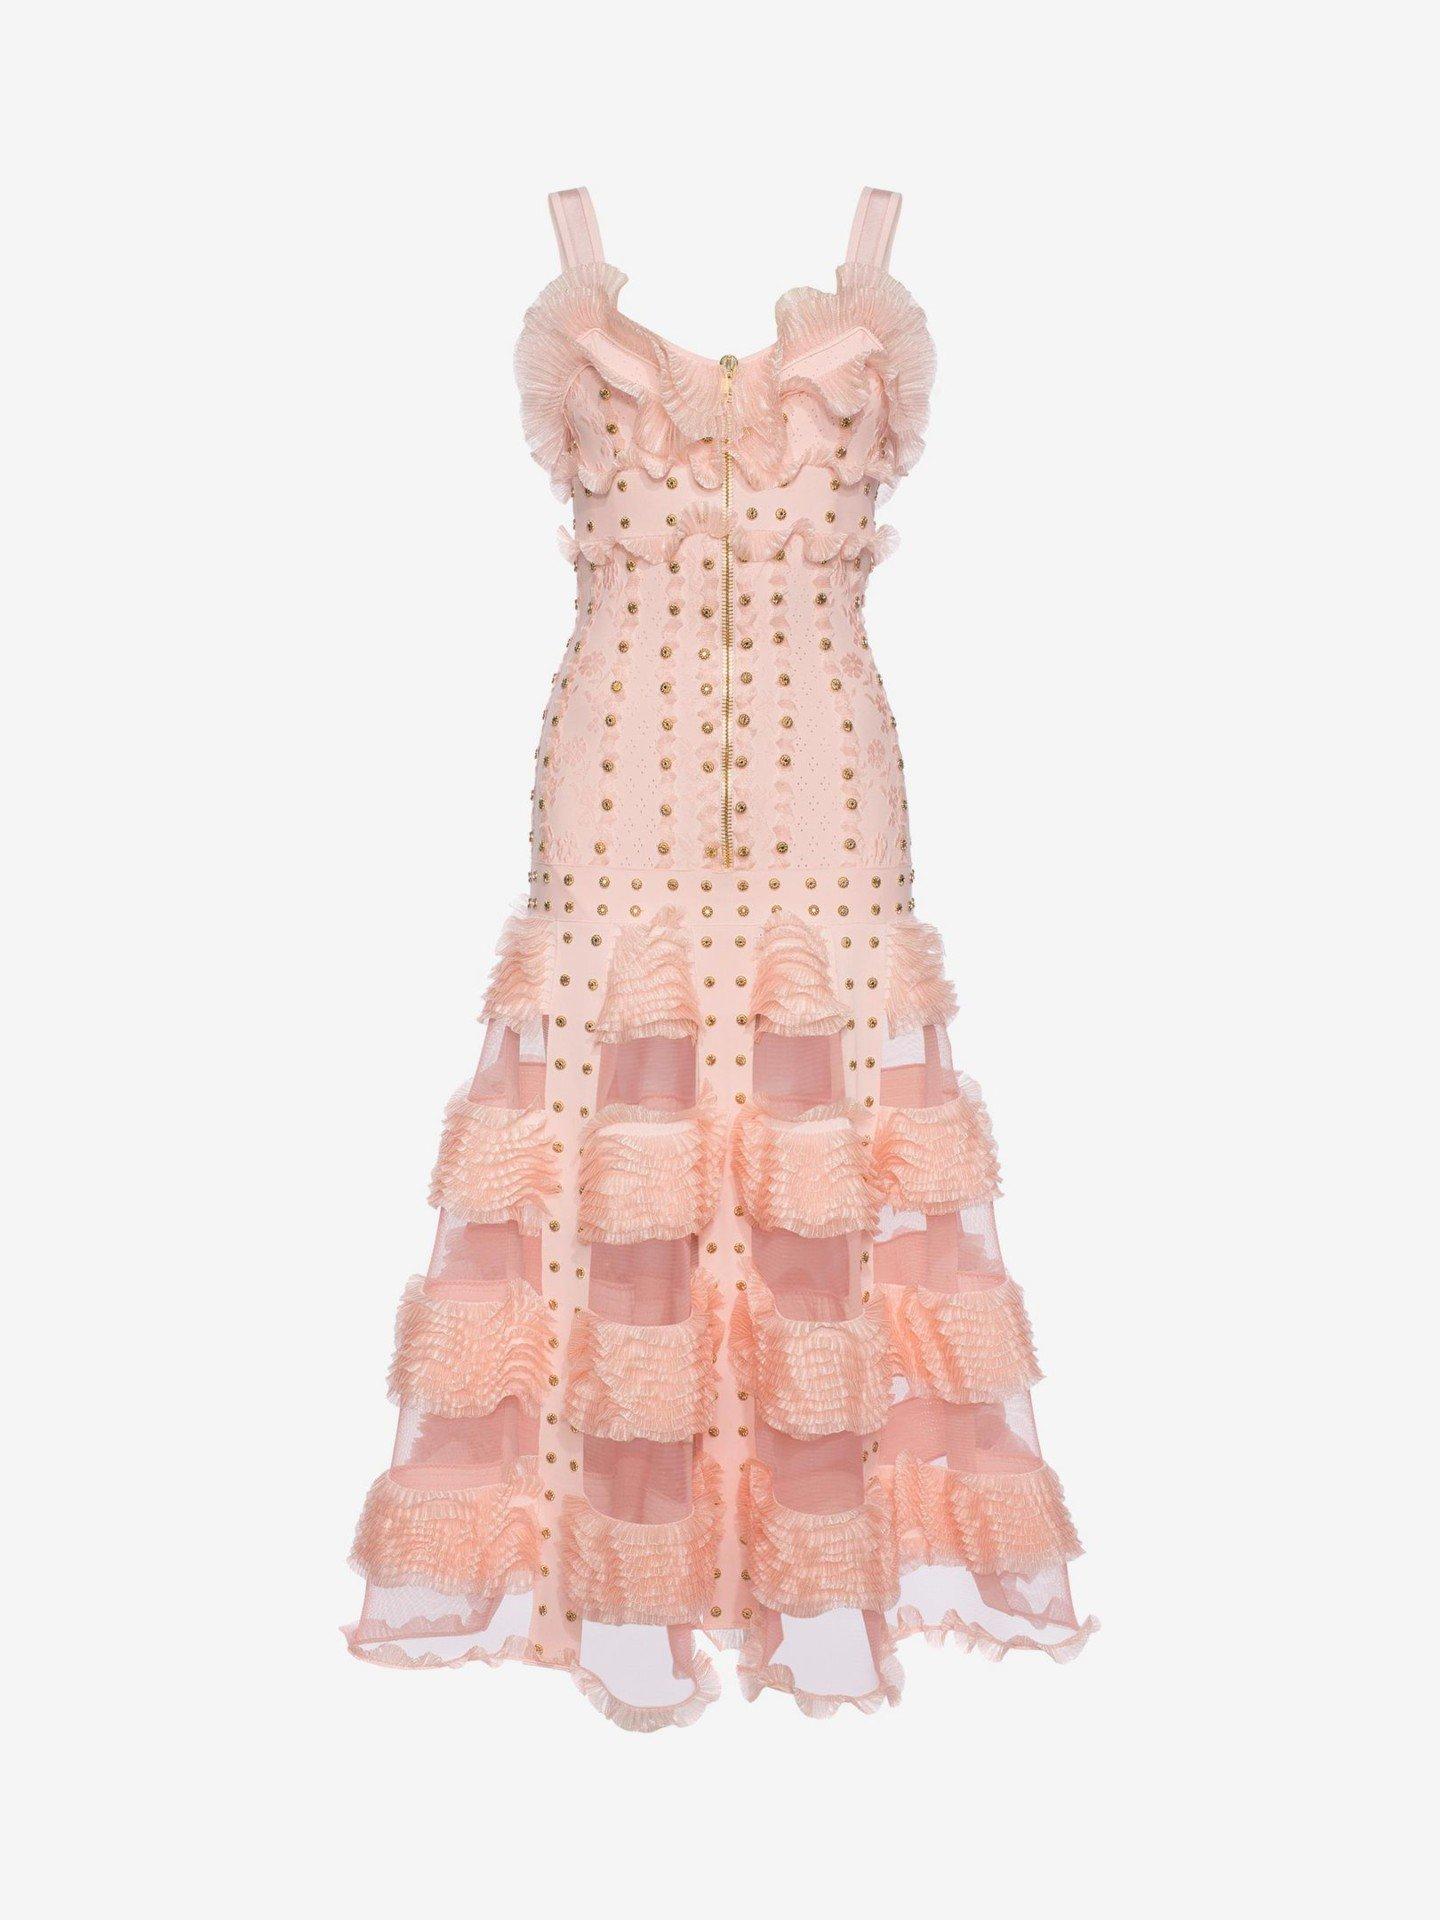 ALEXANDER MCQUEEN Cage Ruffle knitted Long Tint Pink / Gold Dress